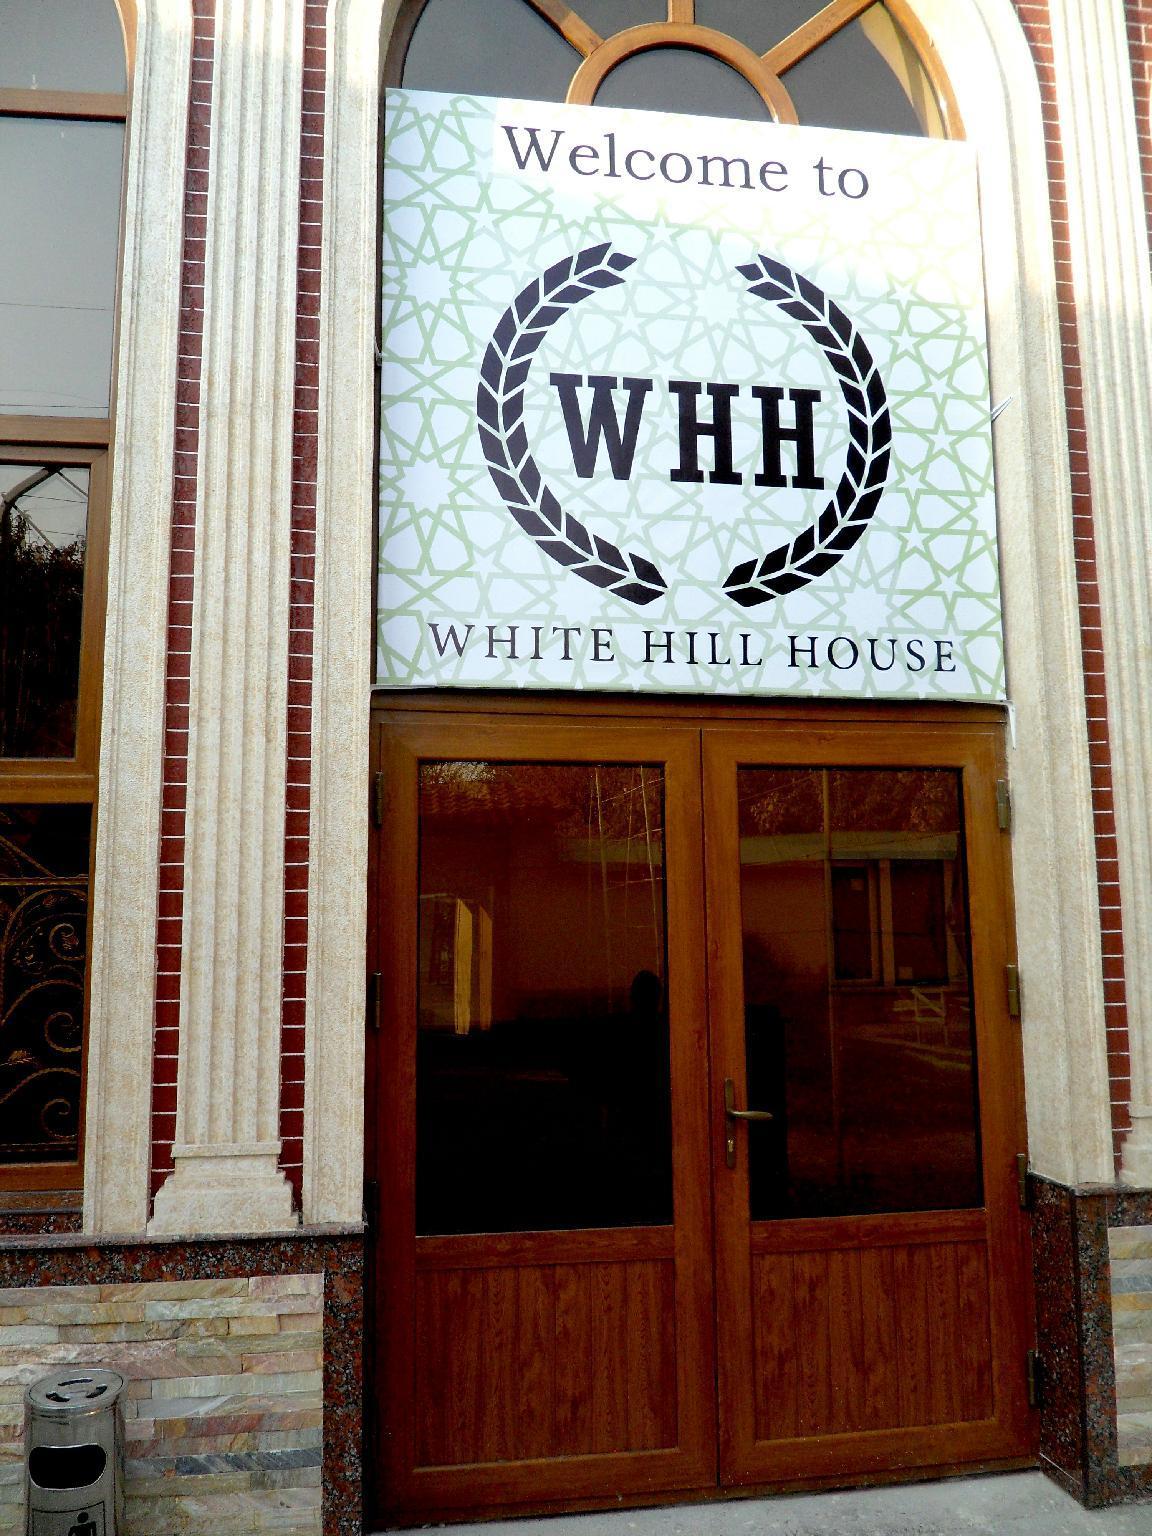 White Hill House